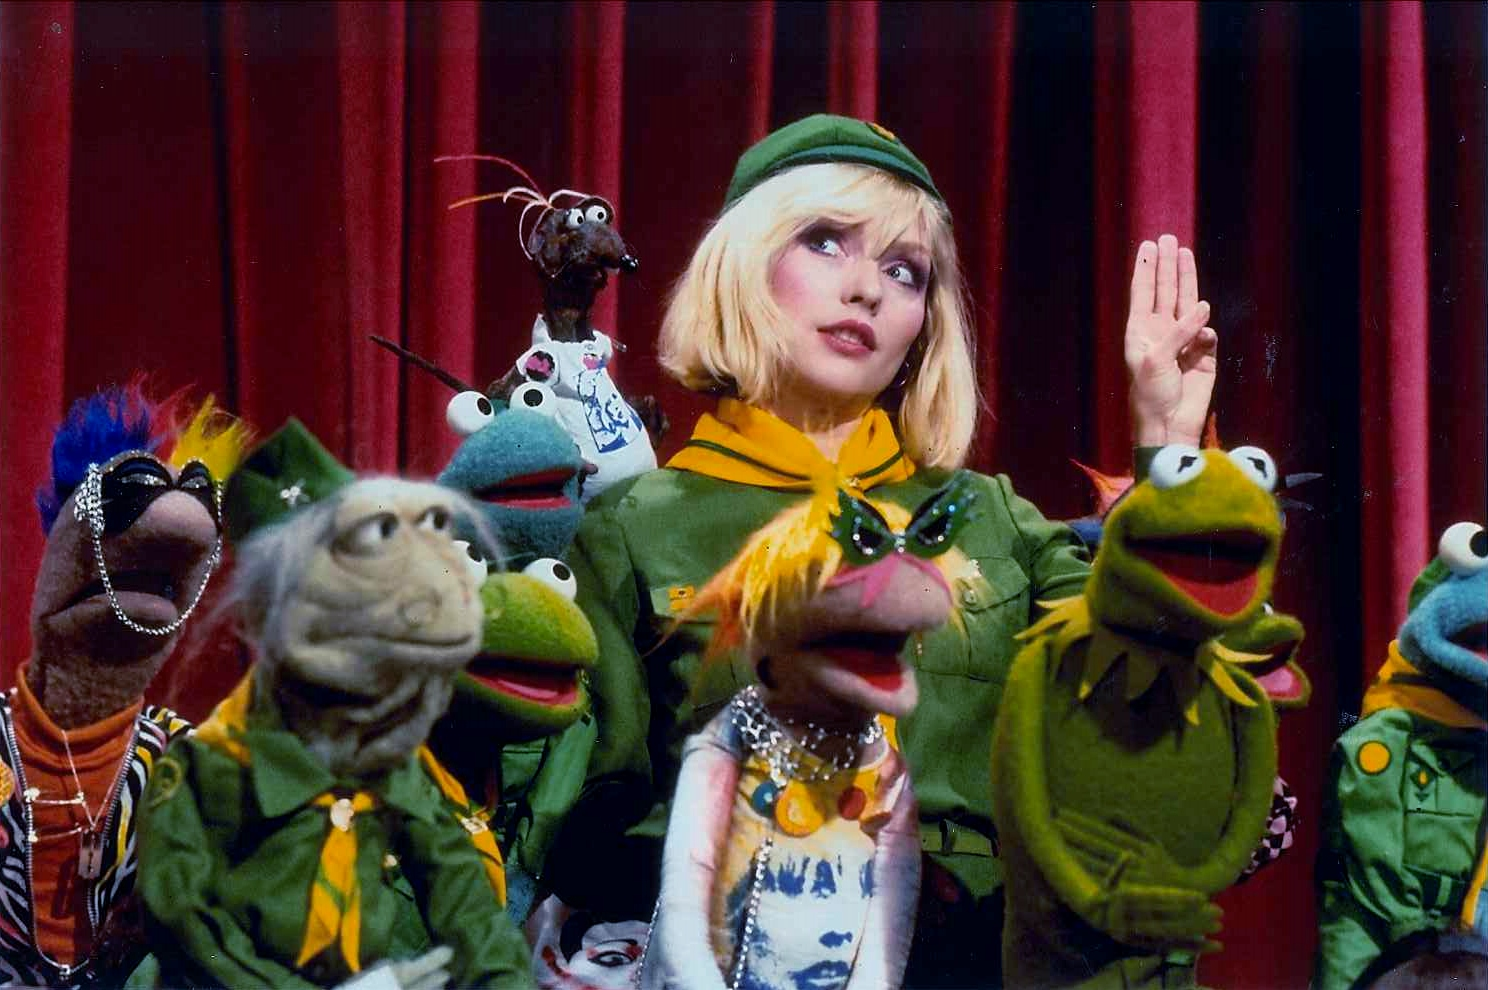 The Muppet Show (TV Series 1976–1981) - Photo Gallery - IMDb